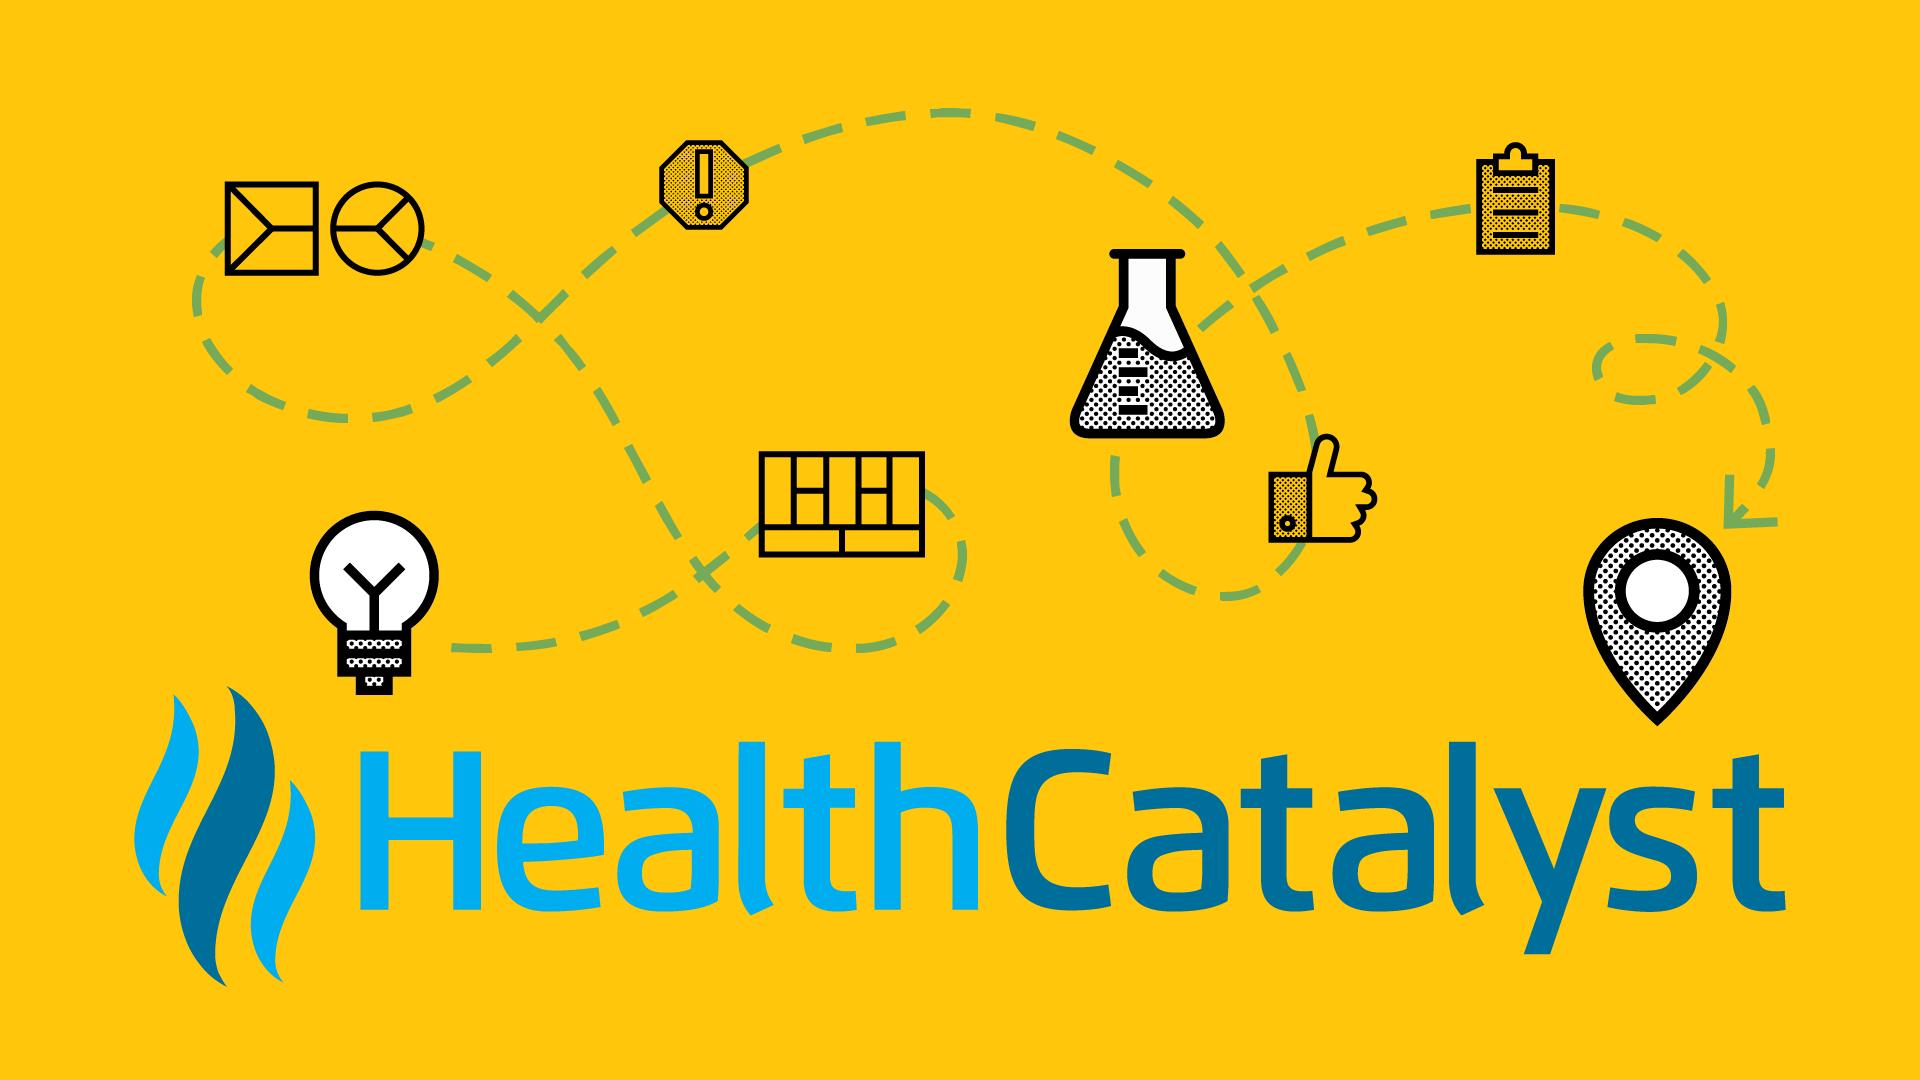 Start testing B2B ideas: The story of Health Catalyst